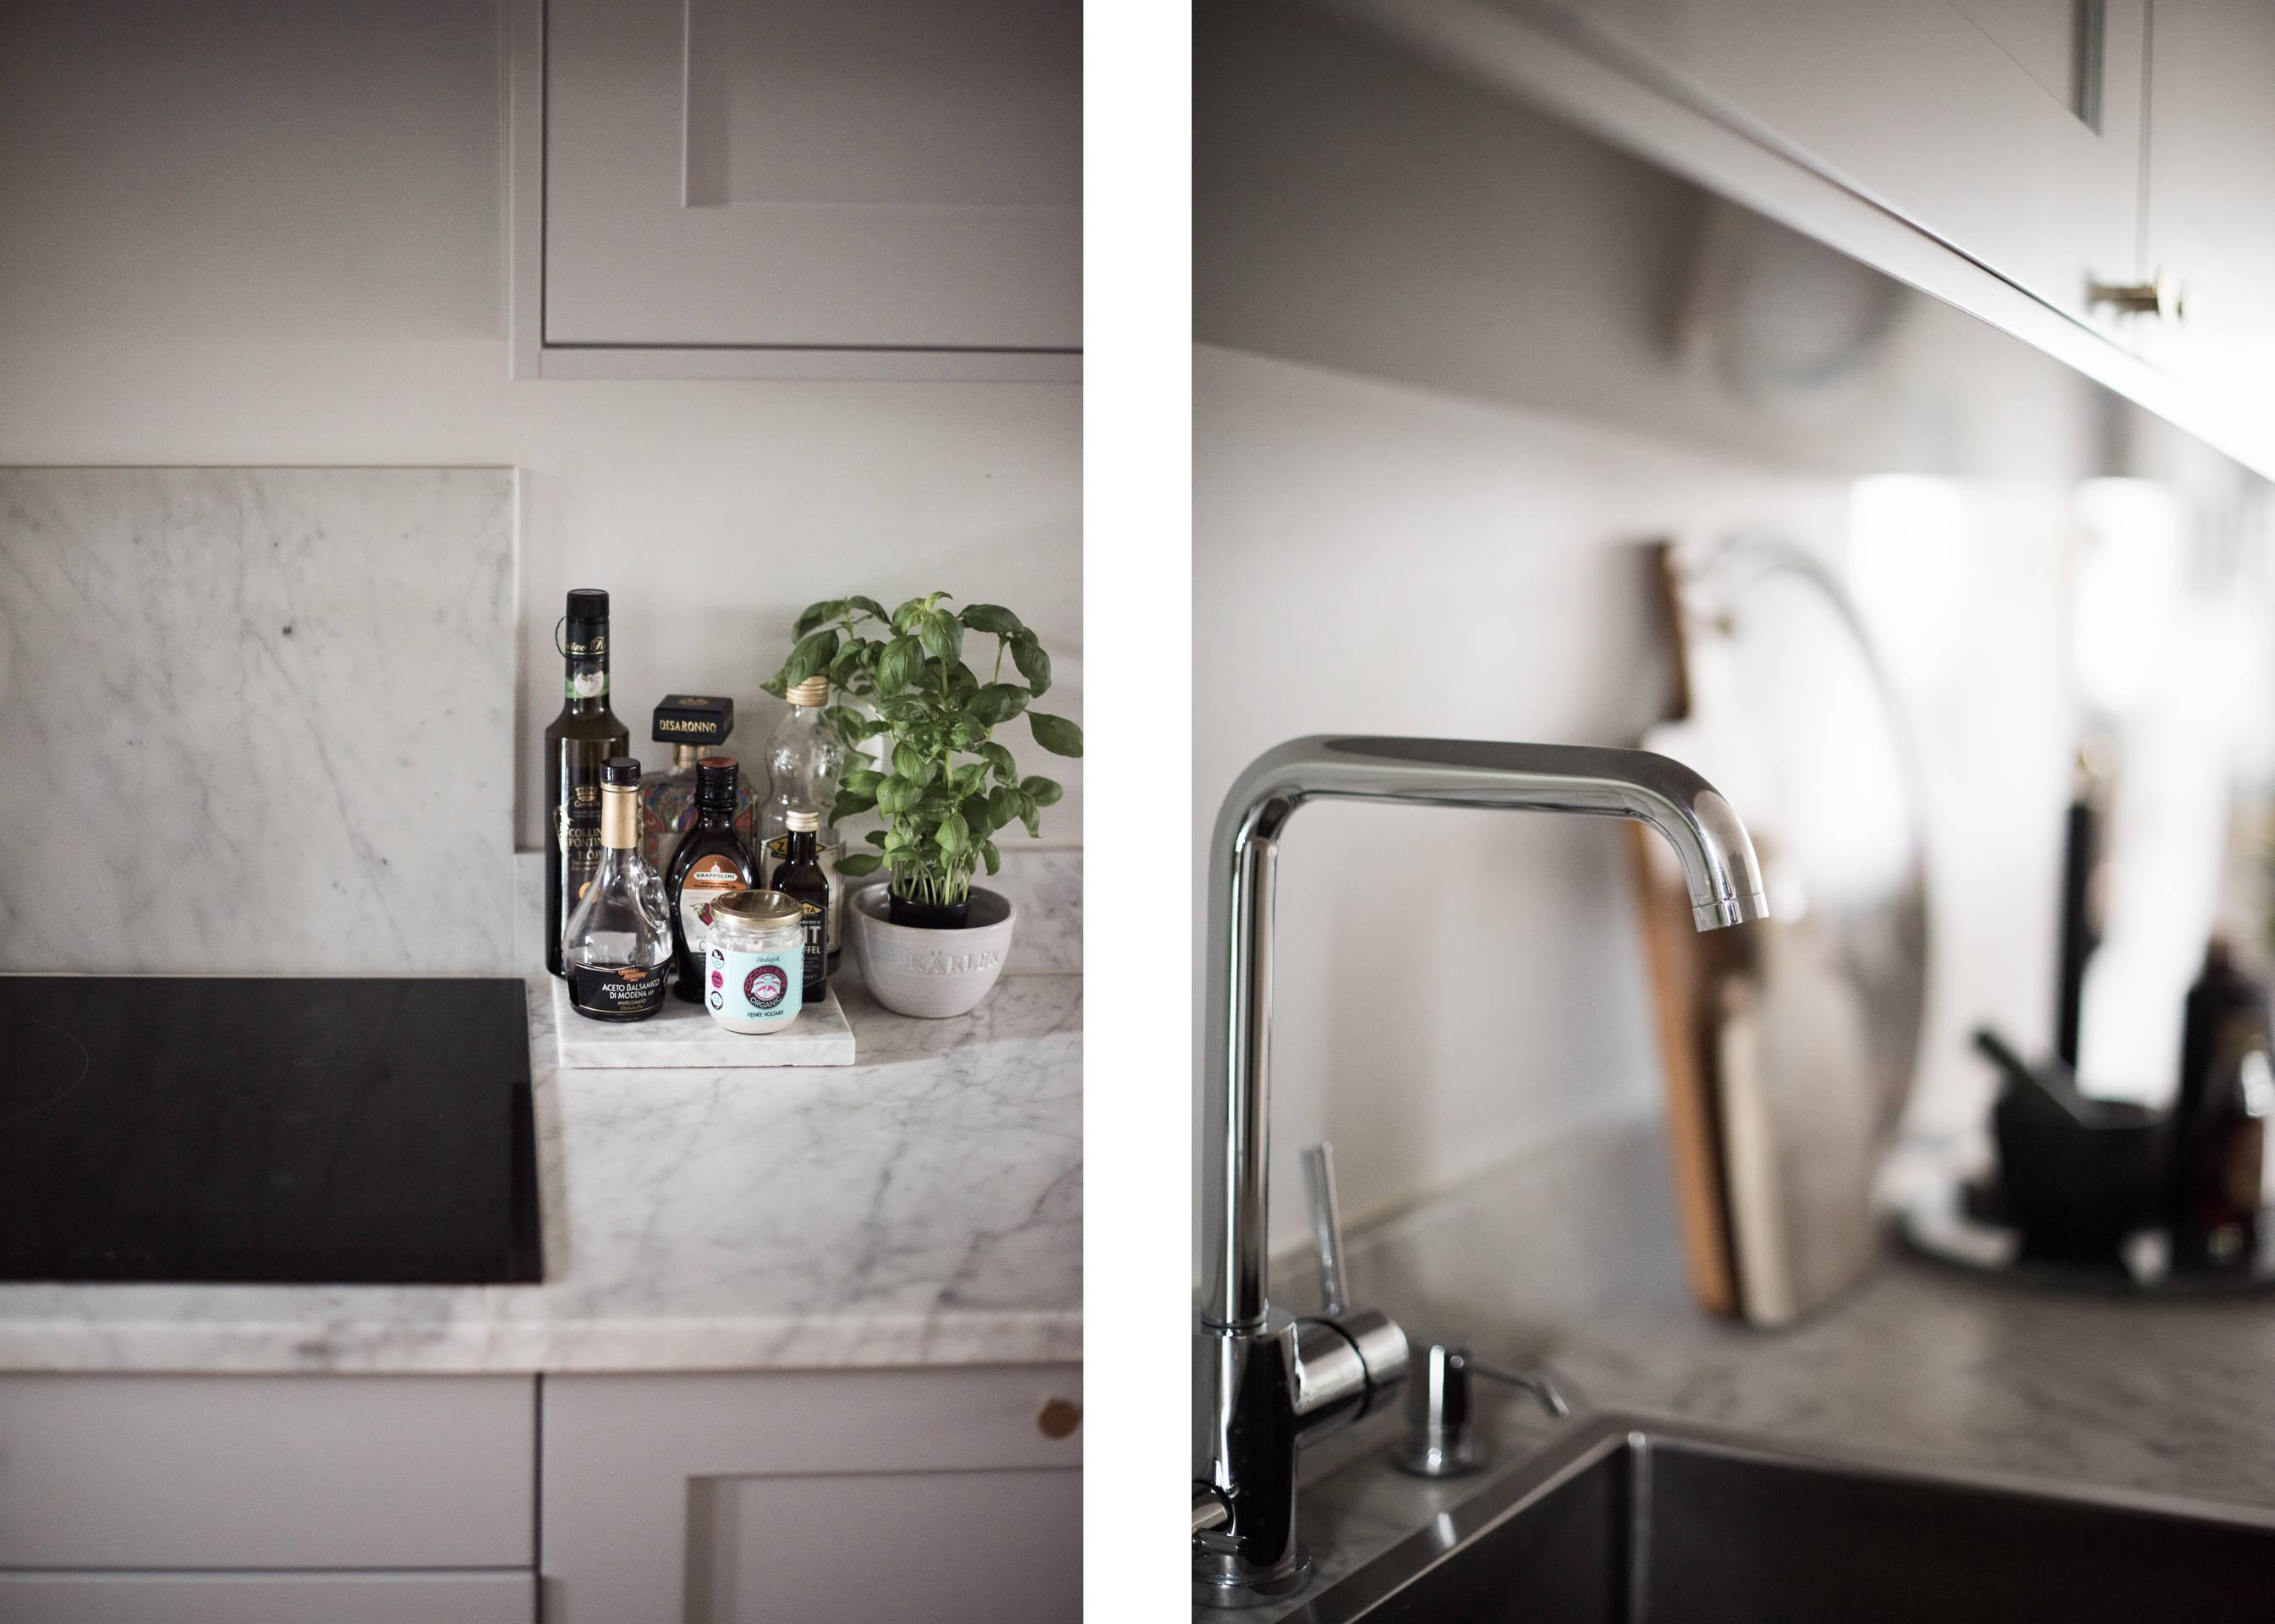 кухня столешница плита  мойка смеситель